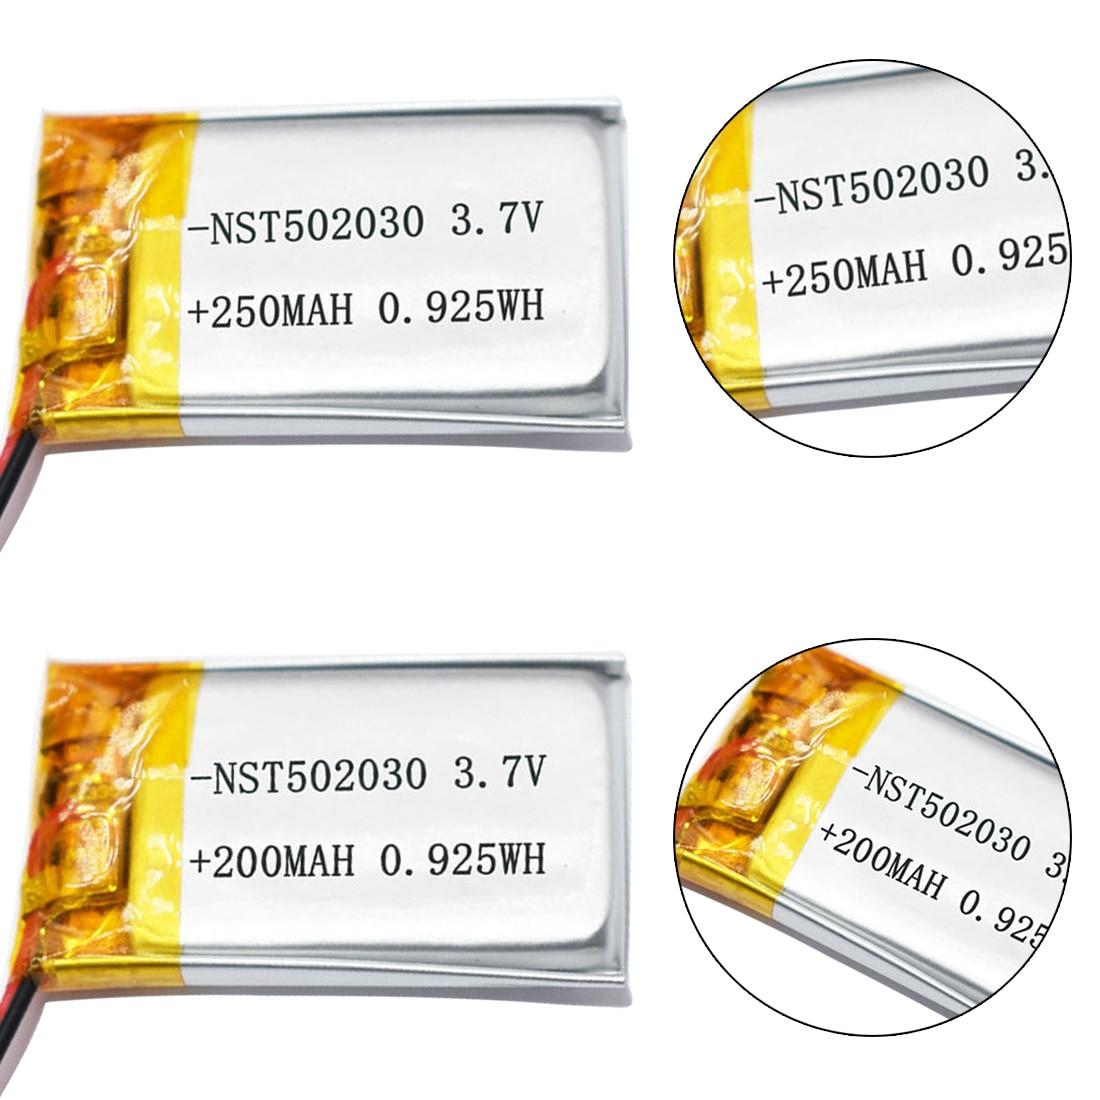 3.7V 200mAh 250mAh 502030 Lithium Polymer Li-Po Li Ion Rechargeable Battery Lipo Cells For MP3 MP4 Toys Speaker Tachograph POS